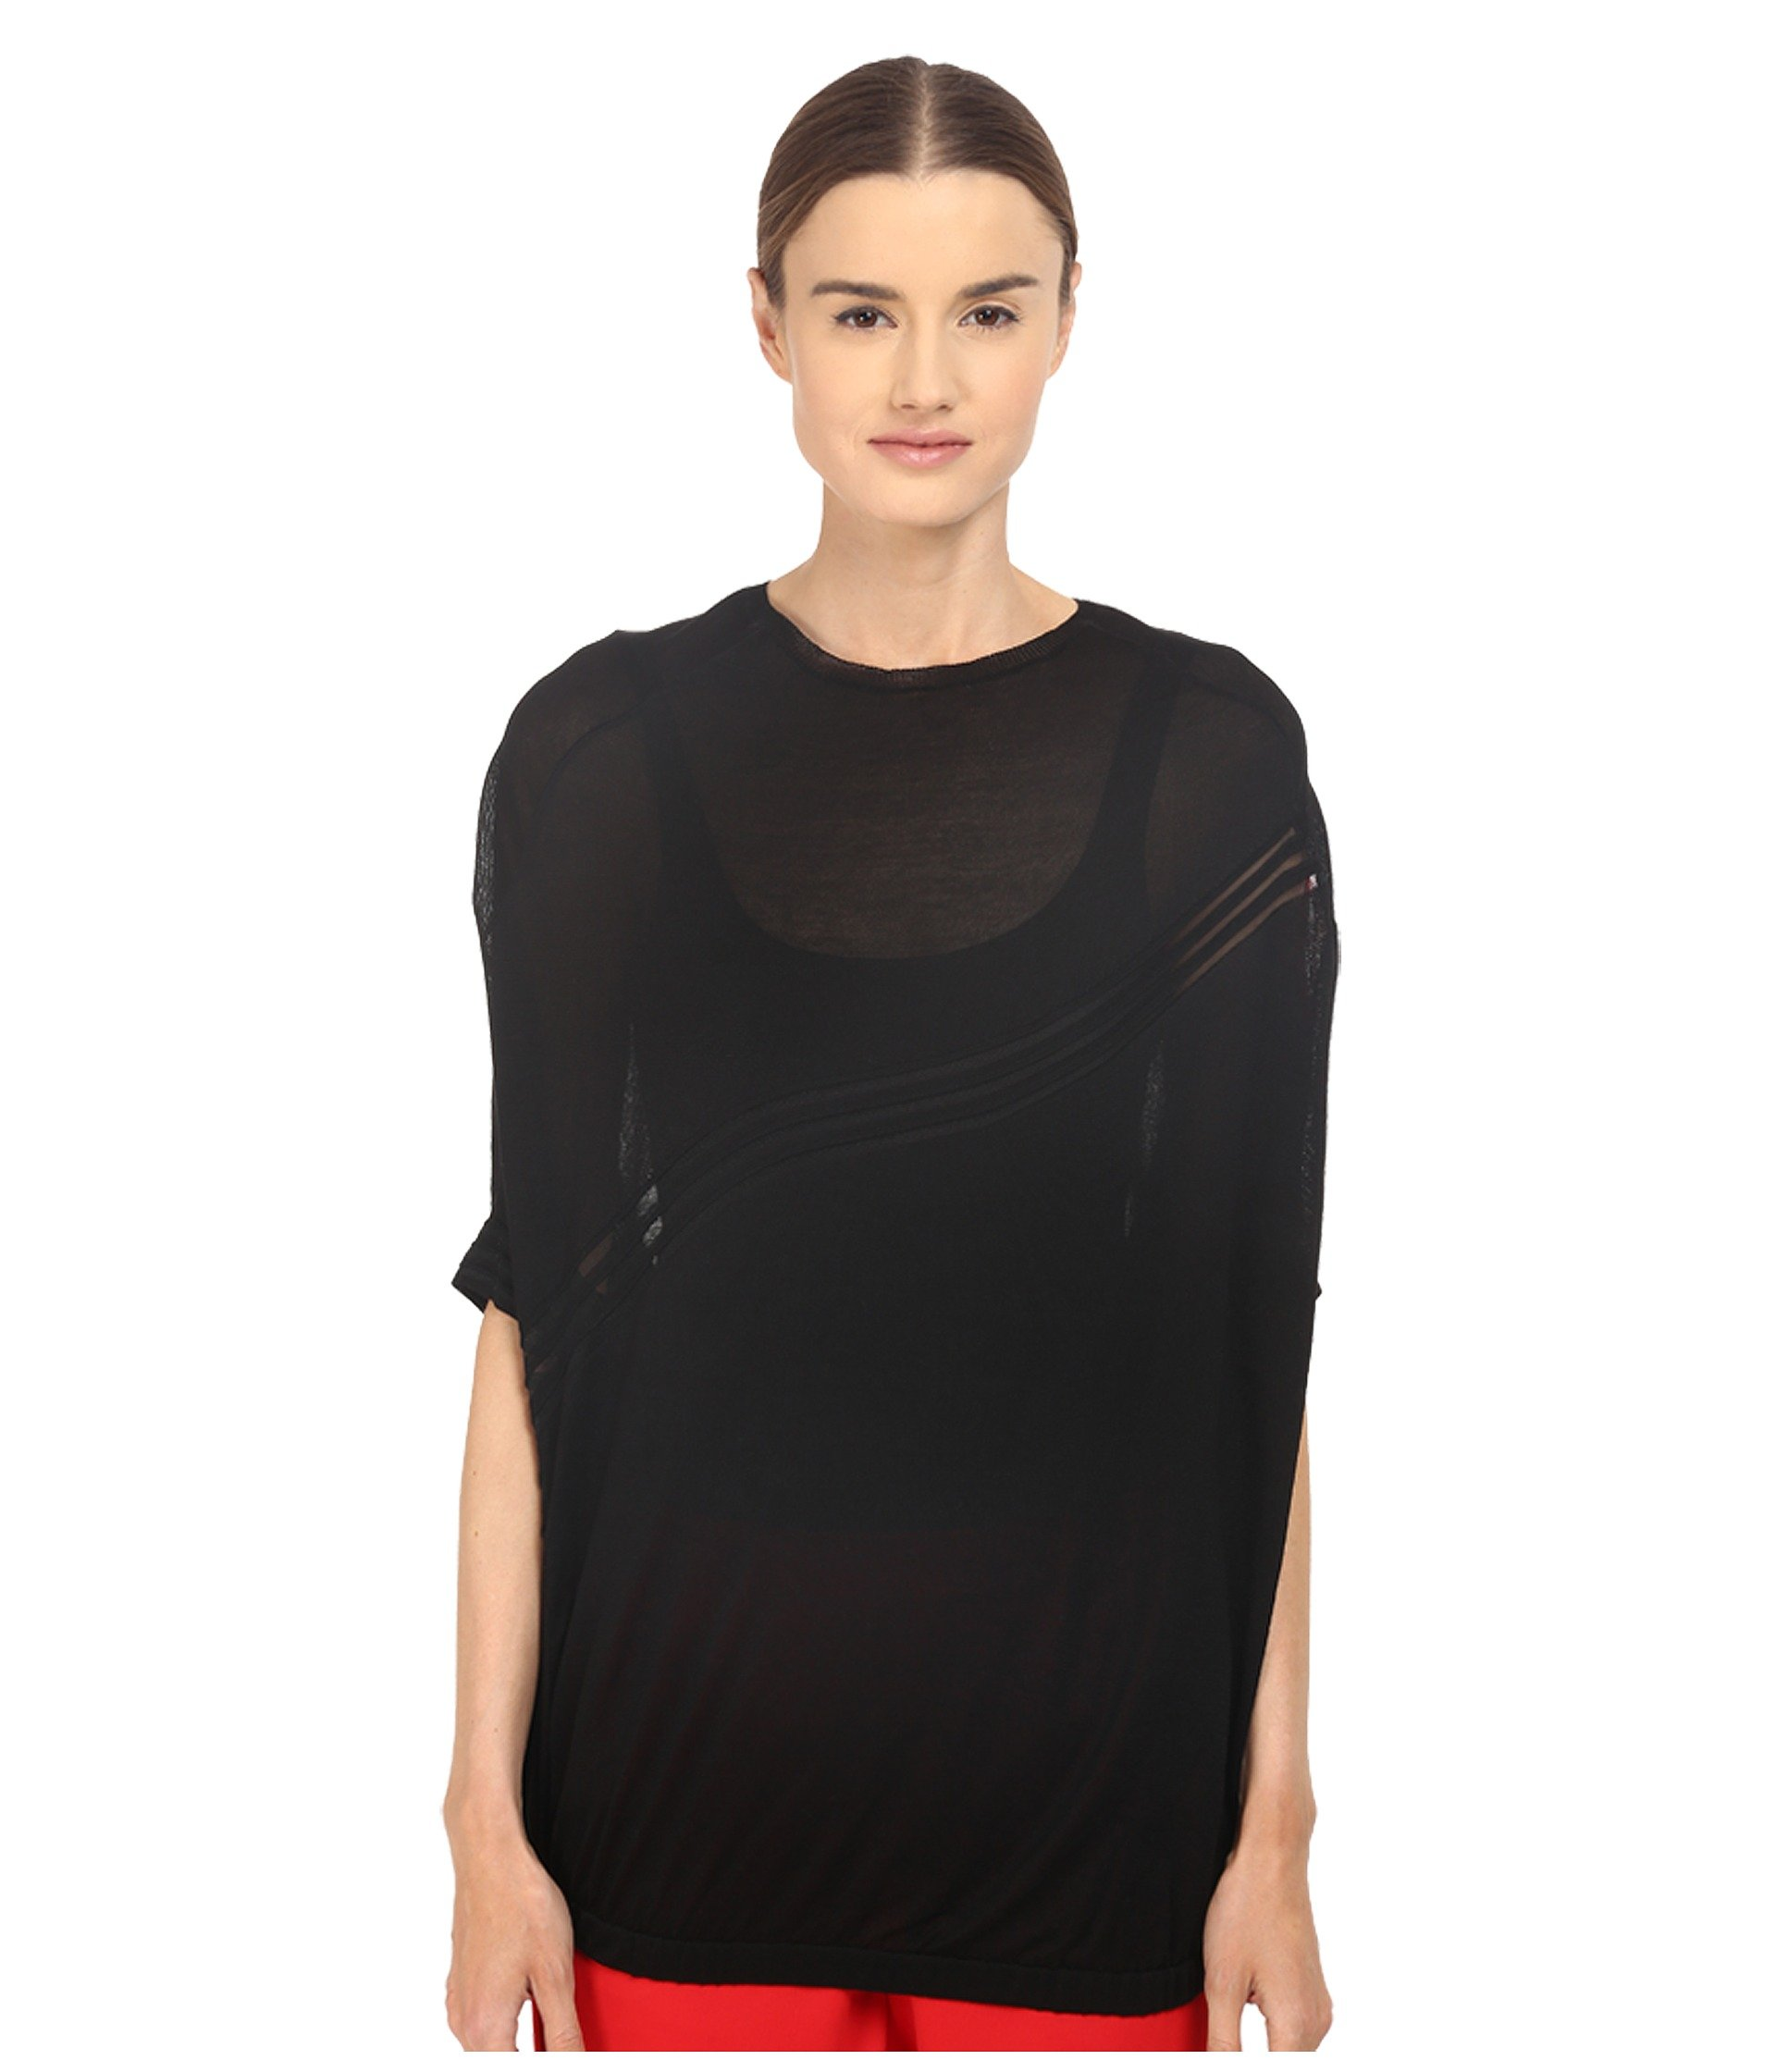 Blusa para Mujer adidas Y-3 by Yohji Yamamoto W Knit Top  + adidas en VeoyCompro.net